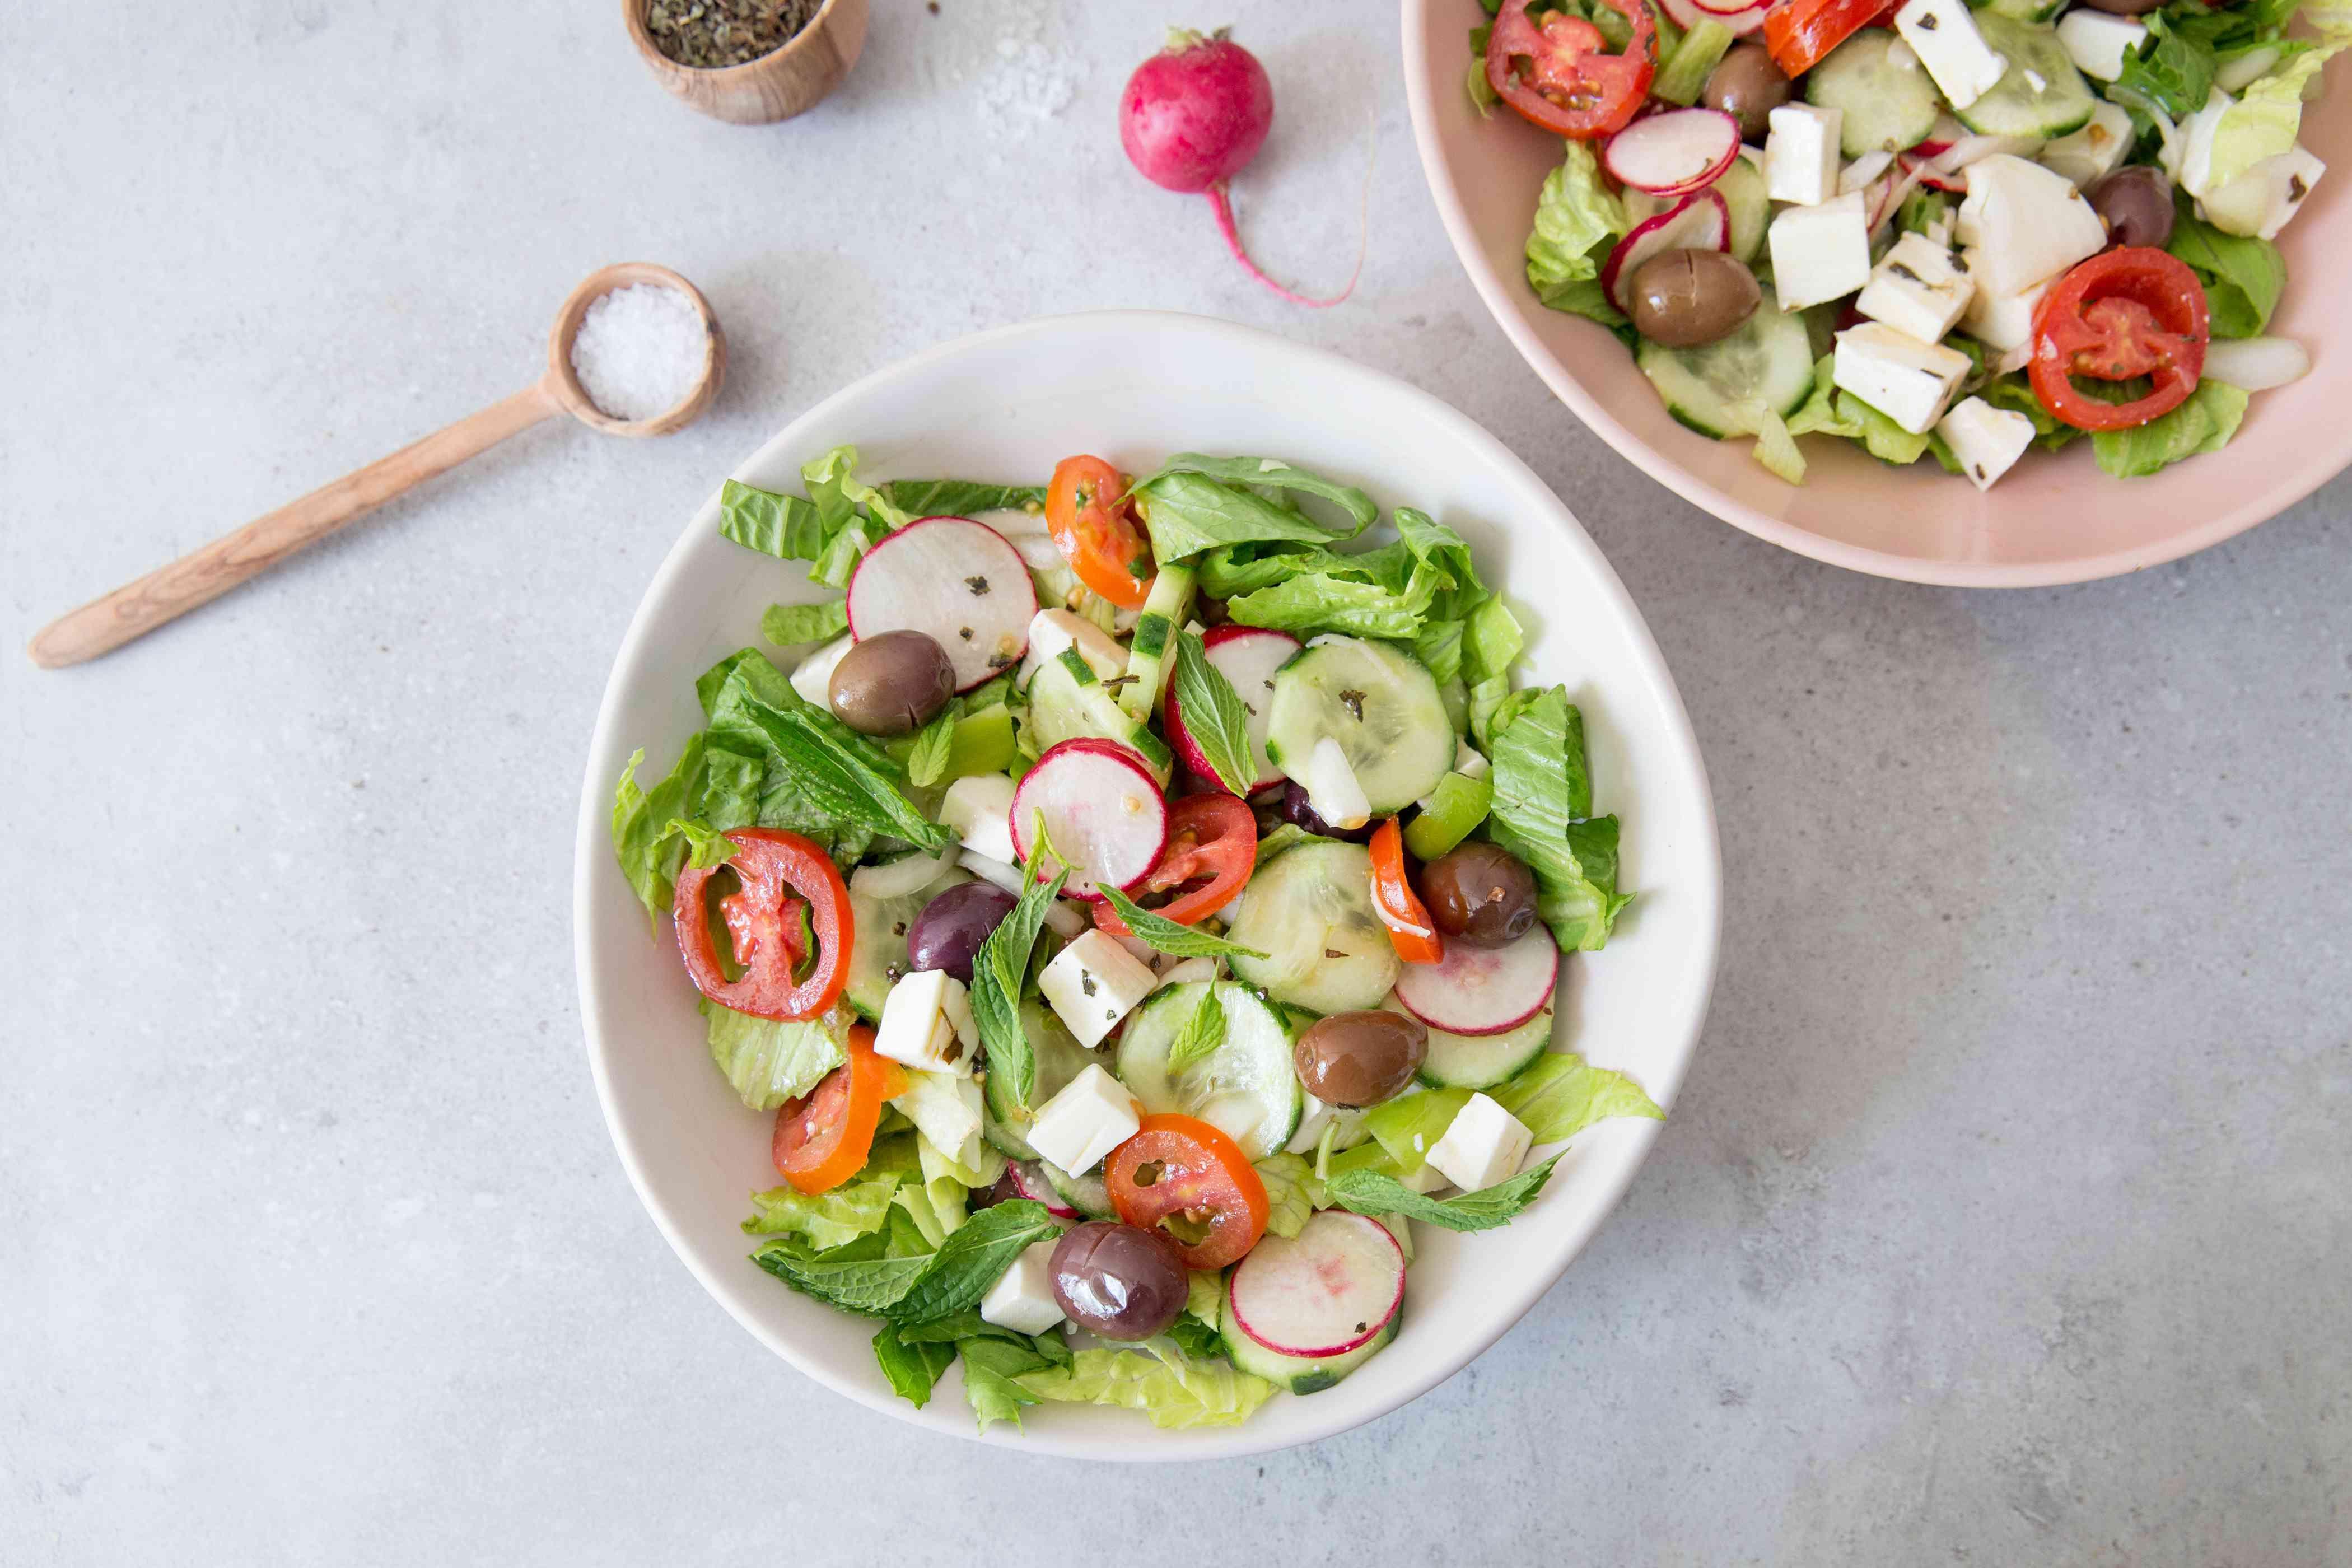 Line salad bowls with lettuce